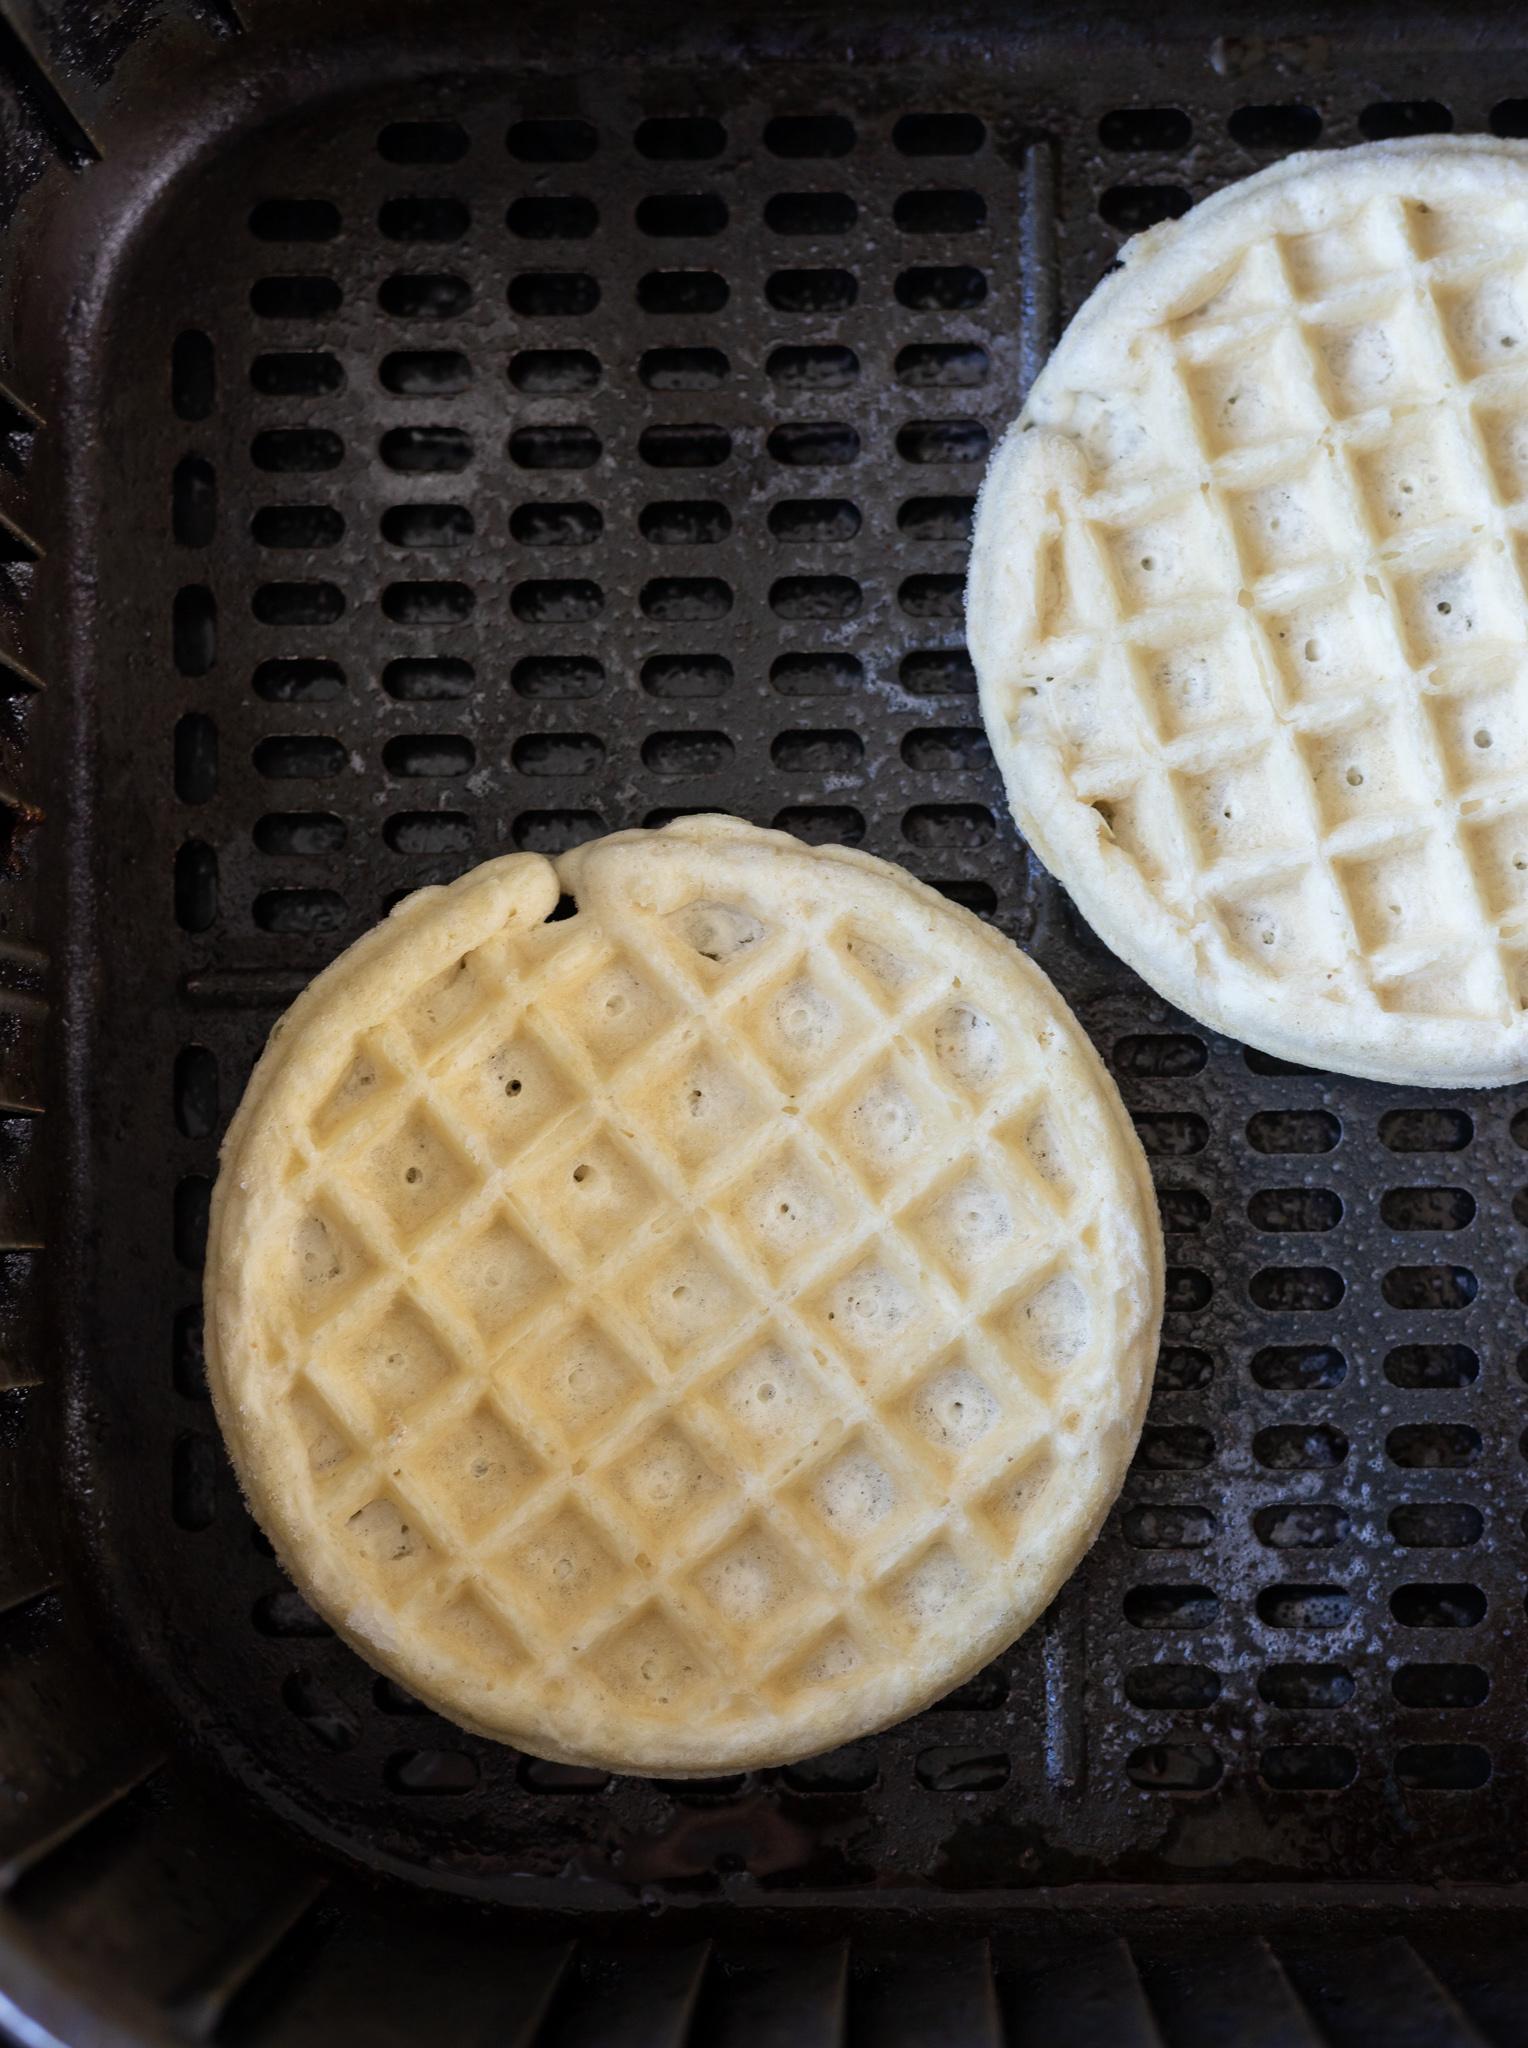 uncooked waffles in air fryer basket